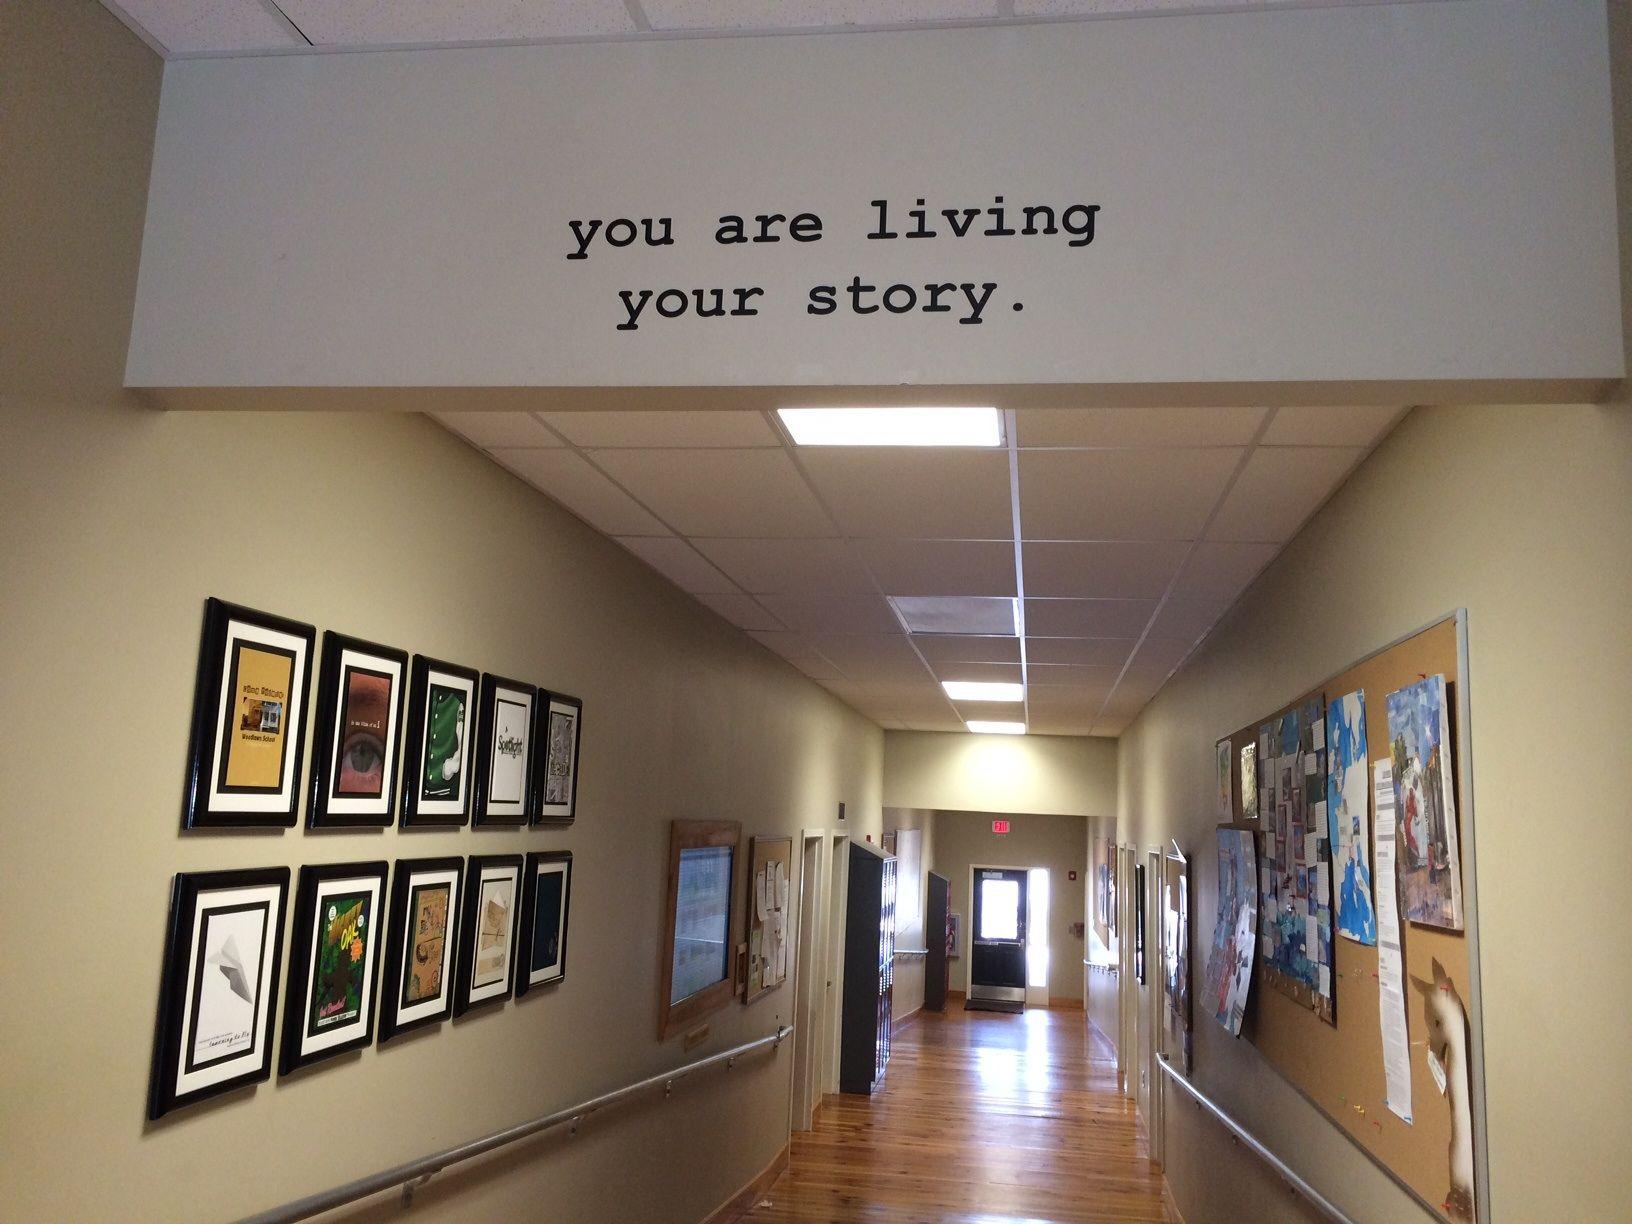 Customer photo from Woodlawn School in North Carolina. We